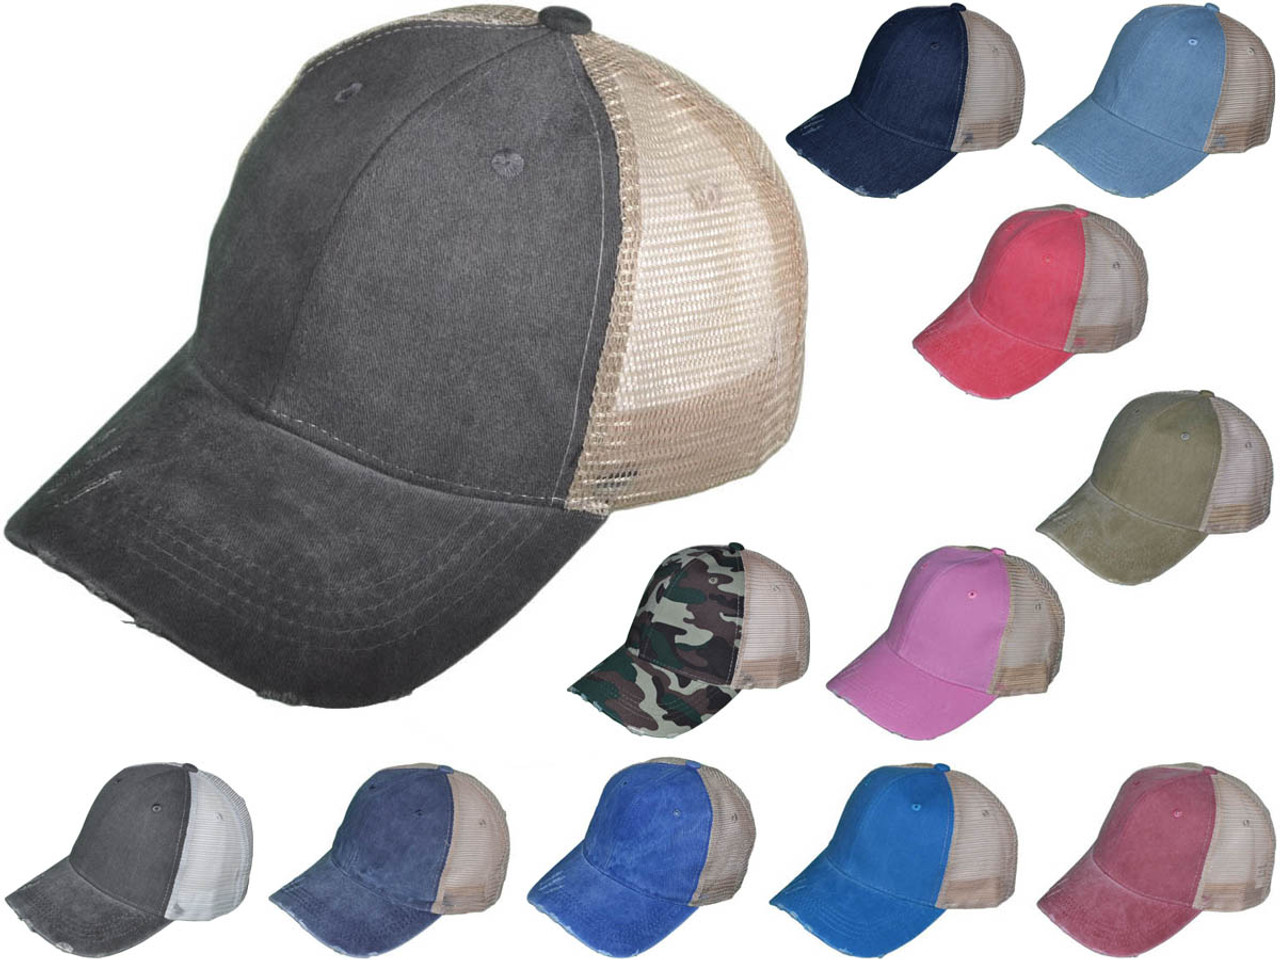 ca99768c3 Vintage Mesh Trucker Hats - BK Caps Low Profile Structured Pigment-Dyed  Cotton (12 Colors Available) - 5026